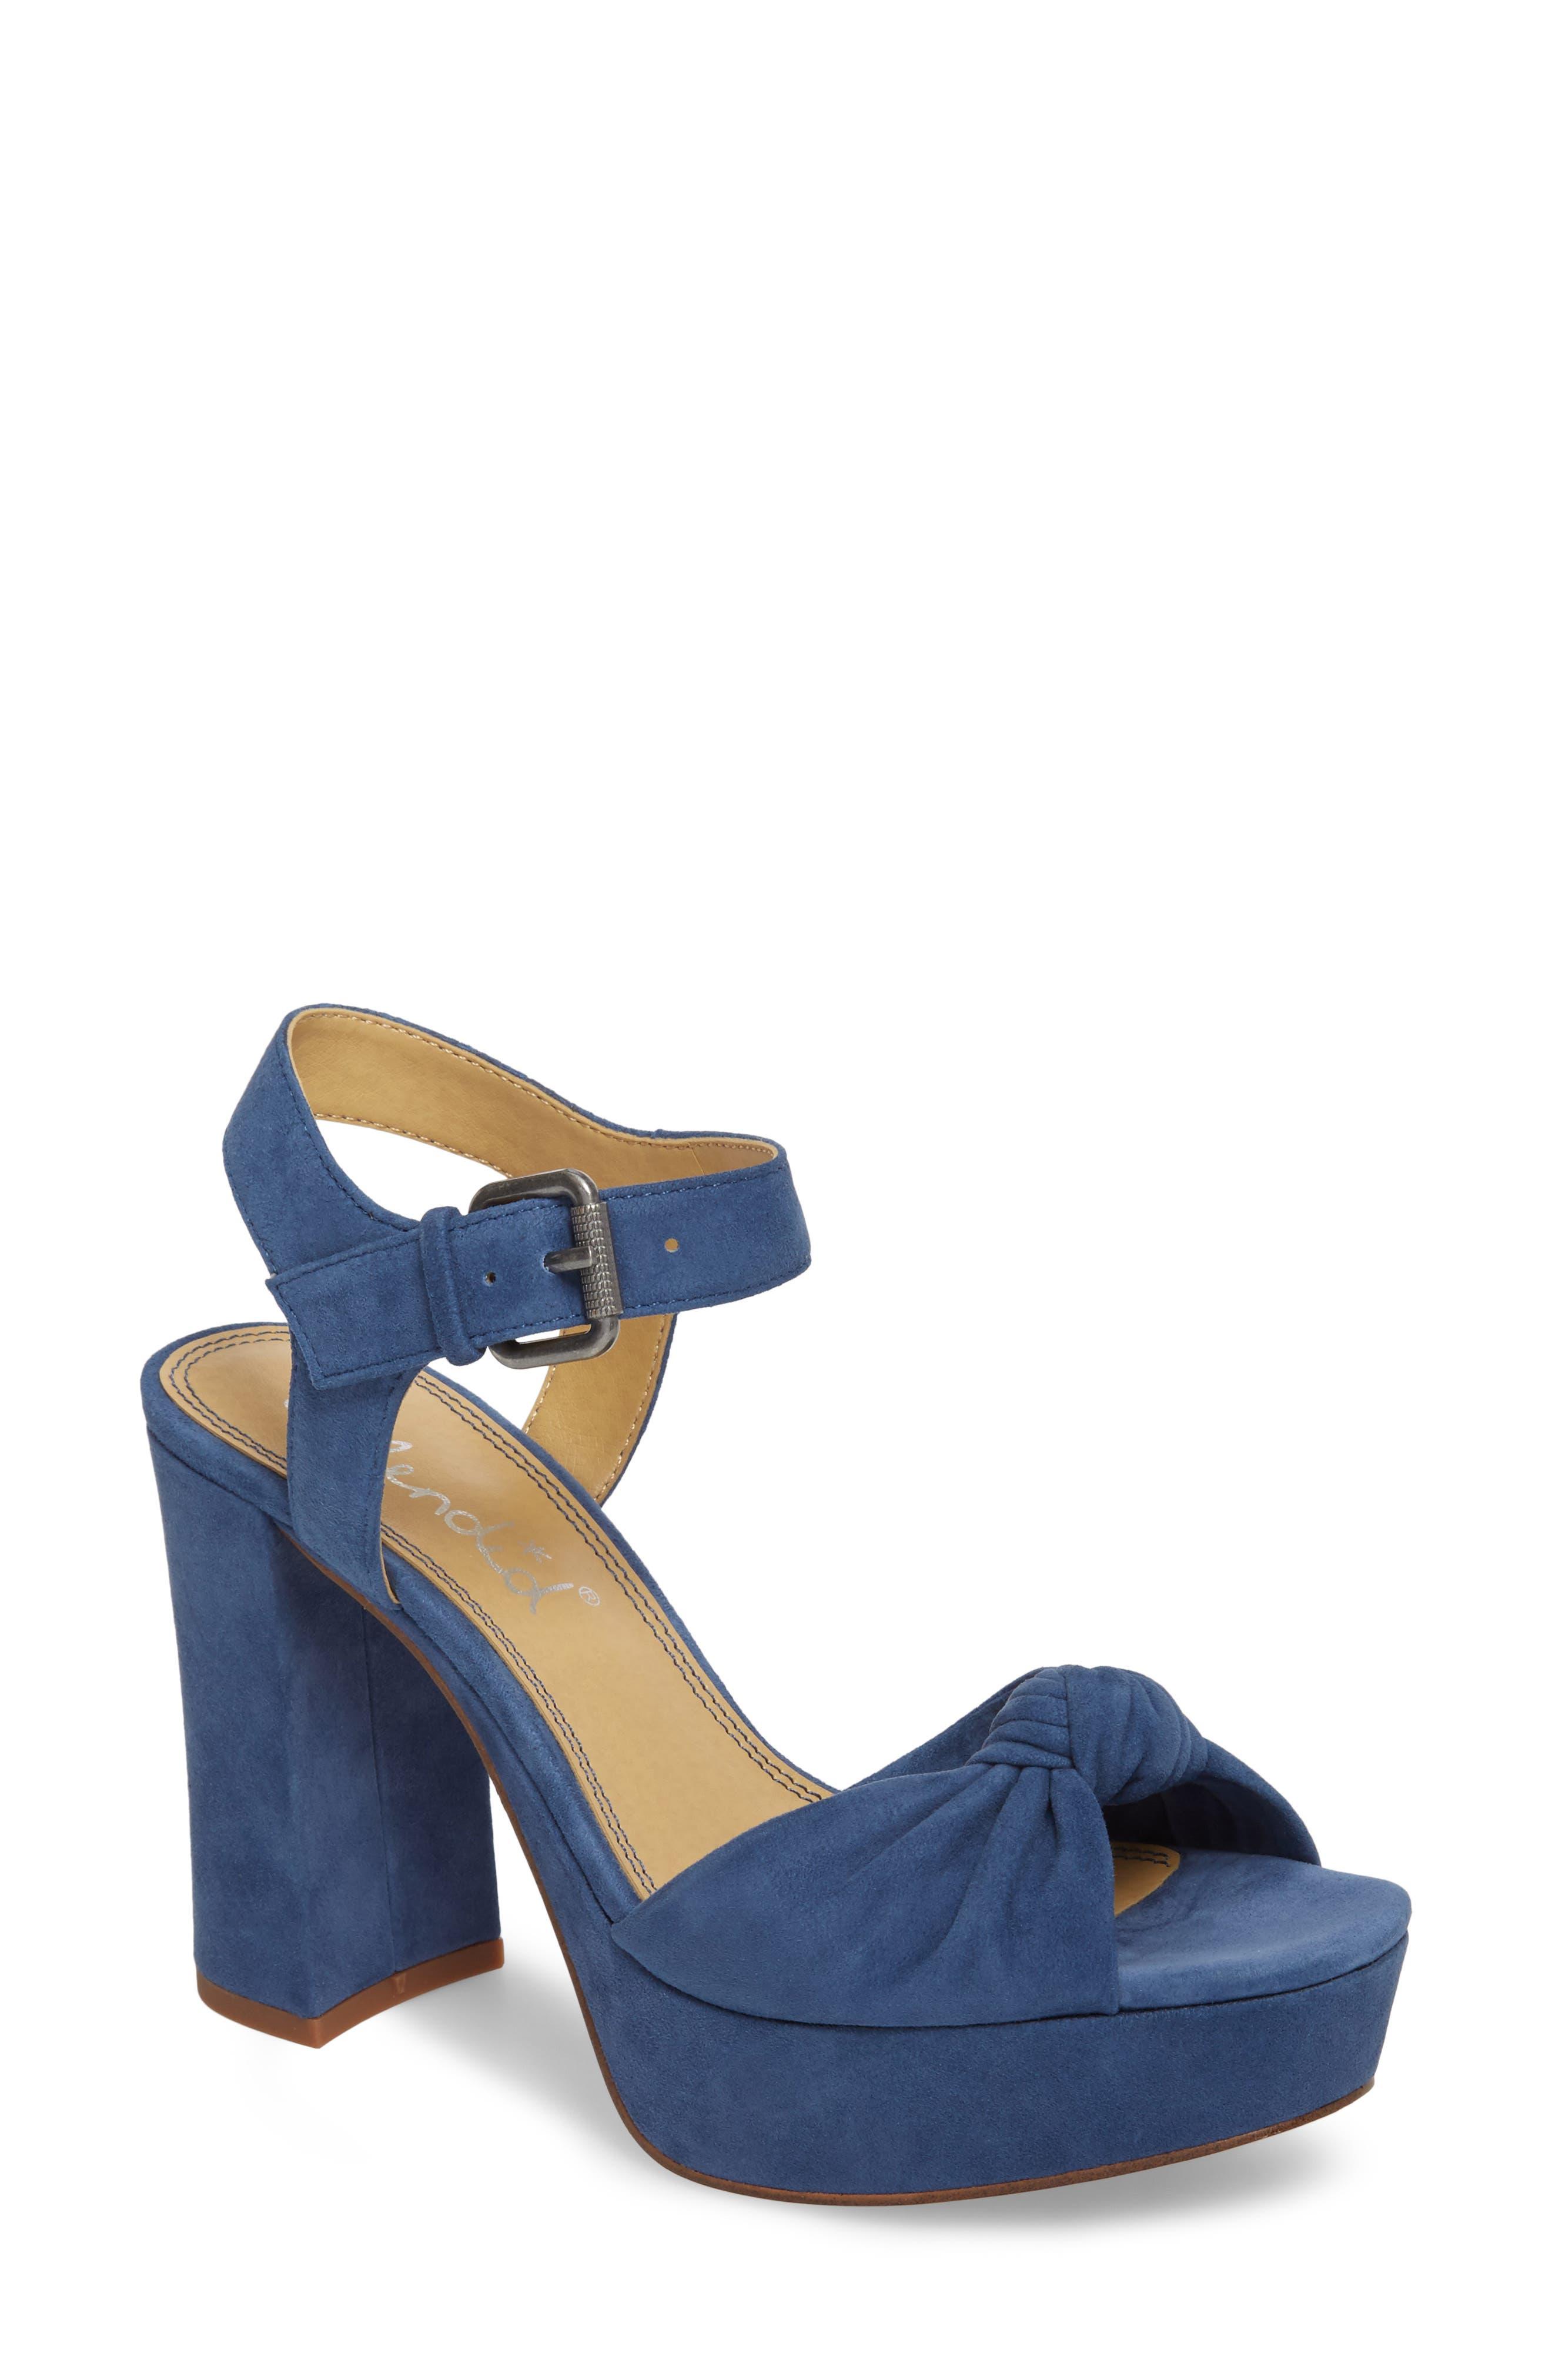 Splendid Bates Platform Sandal- Blue